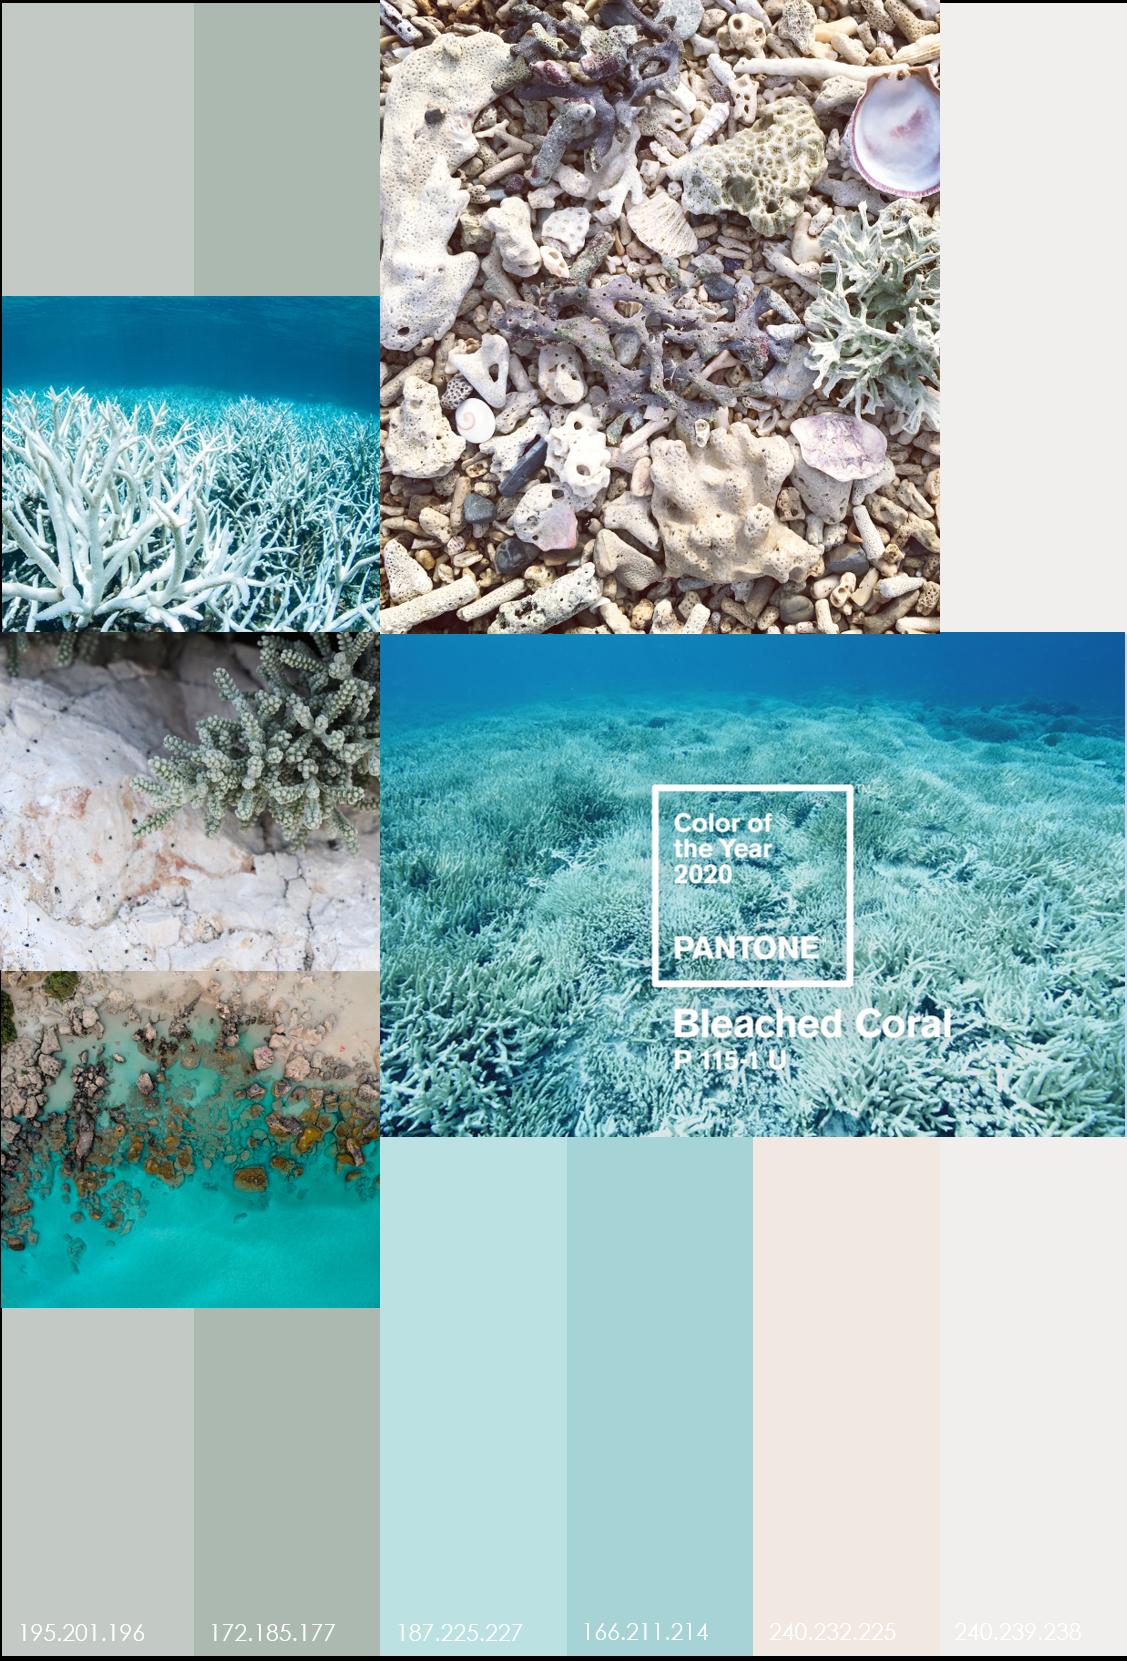 GZ STUDIO {Bleached Coral} Volgens ontwerpstudio Jack&Huei vergeet Pantone met d...